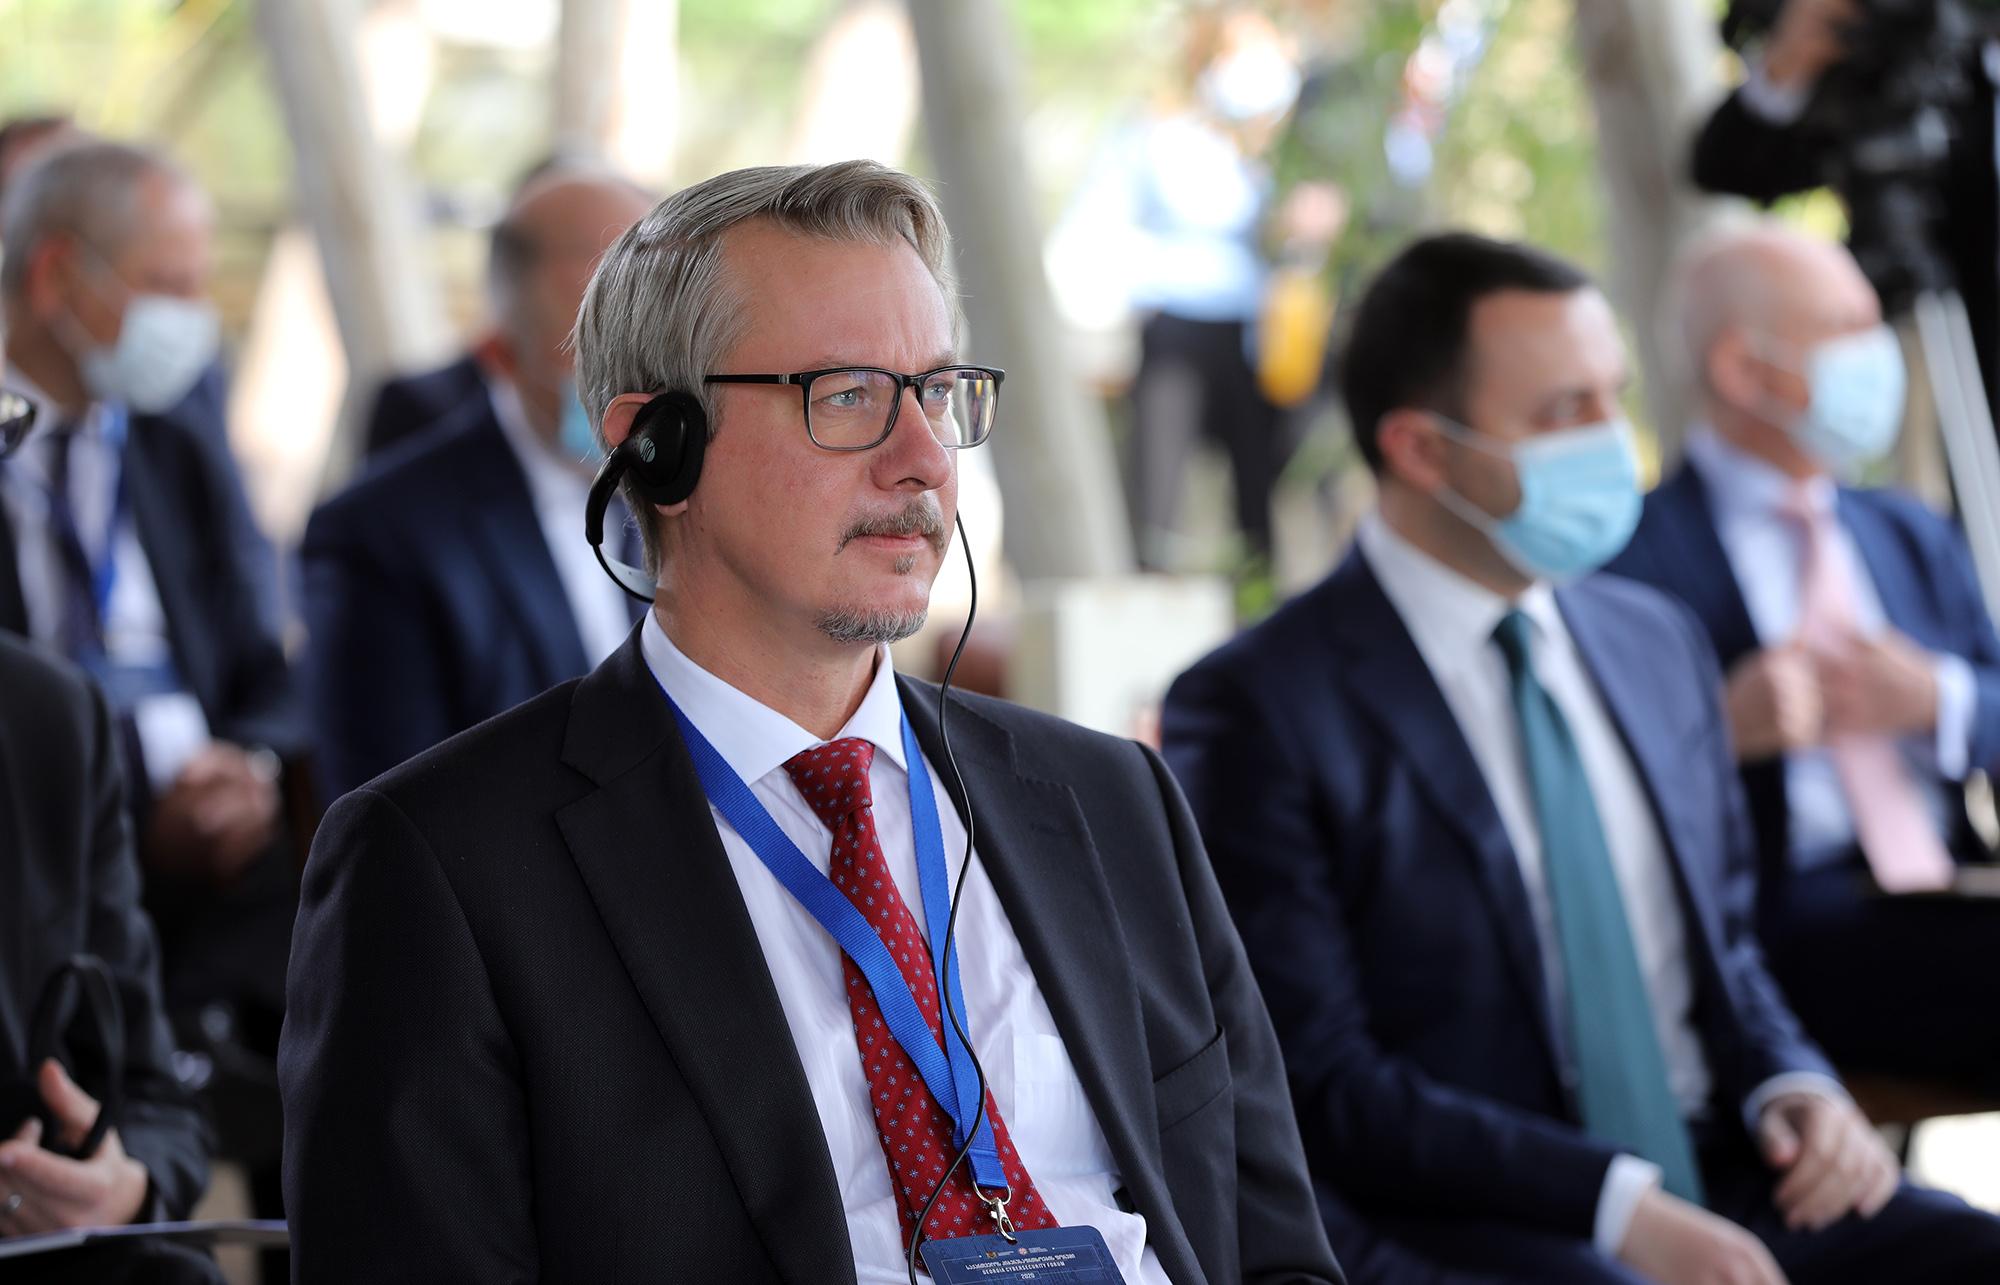 Carl Hartzell 43 #новости Карл Харцель